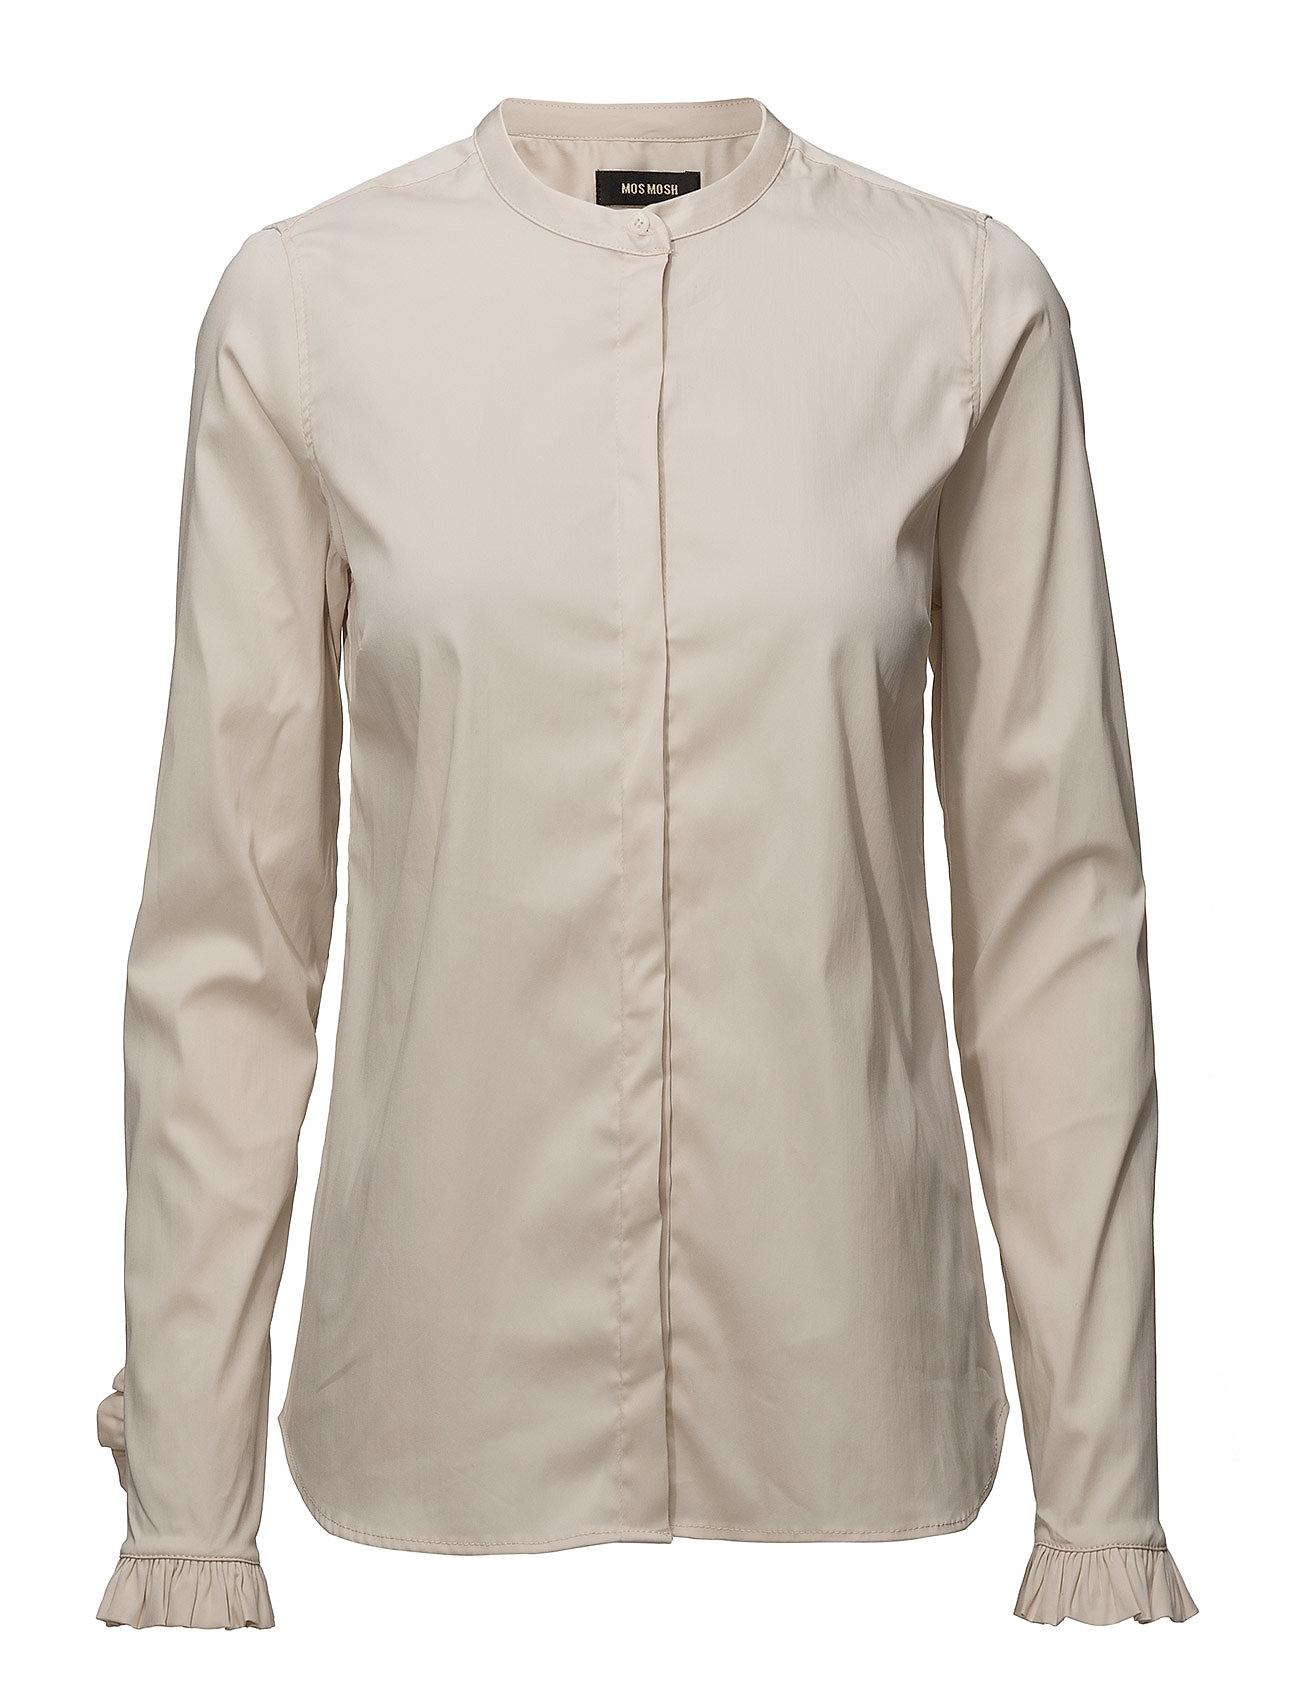 MOS MOSH Mattie Shirt - ECRU